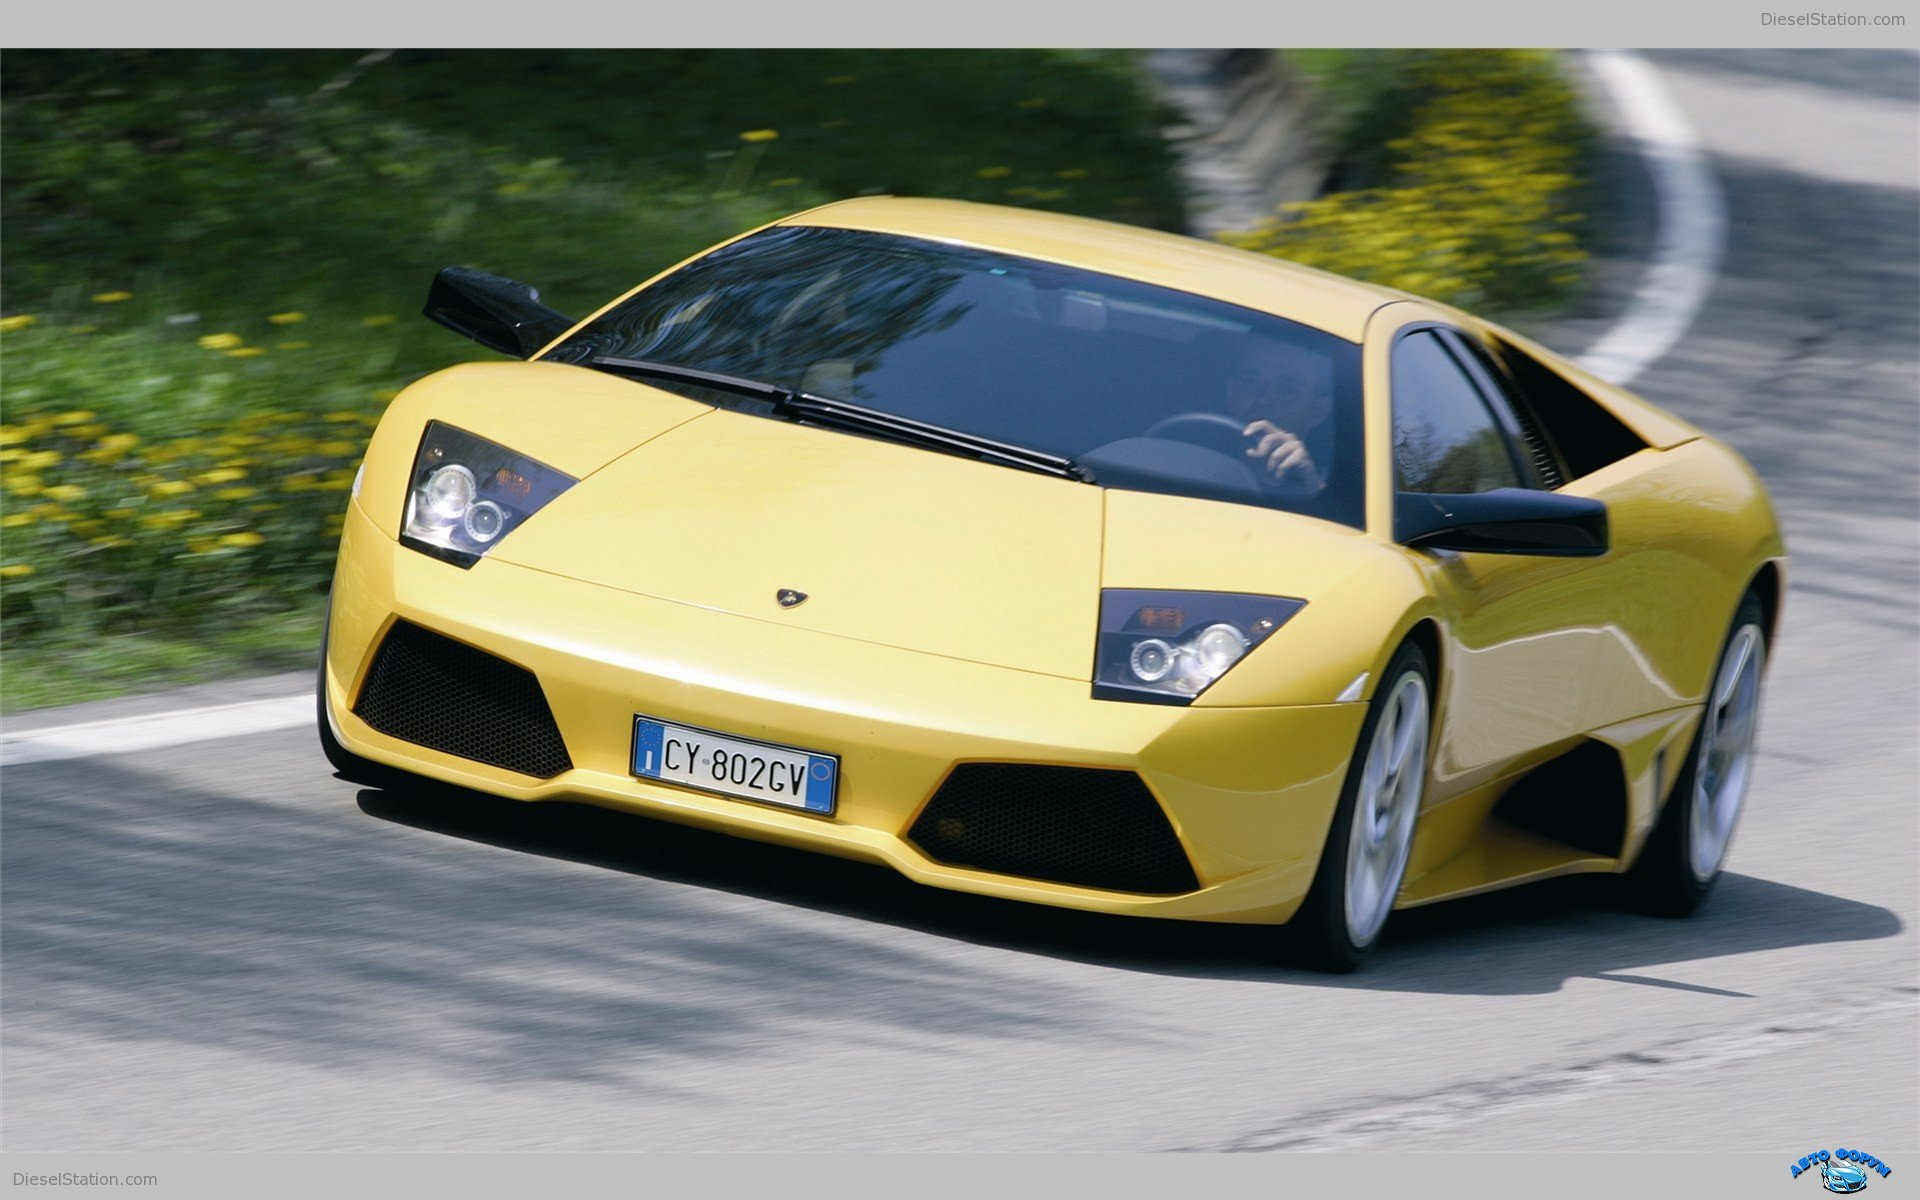 Lamborghini-Murci-lago-LP640-2006-widescreen-12.jpg